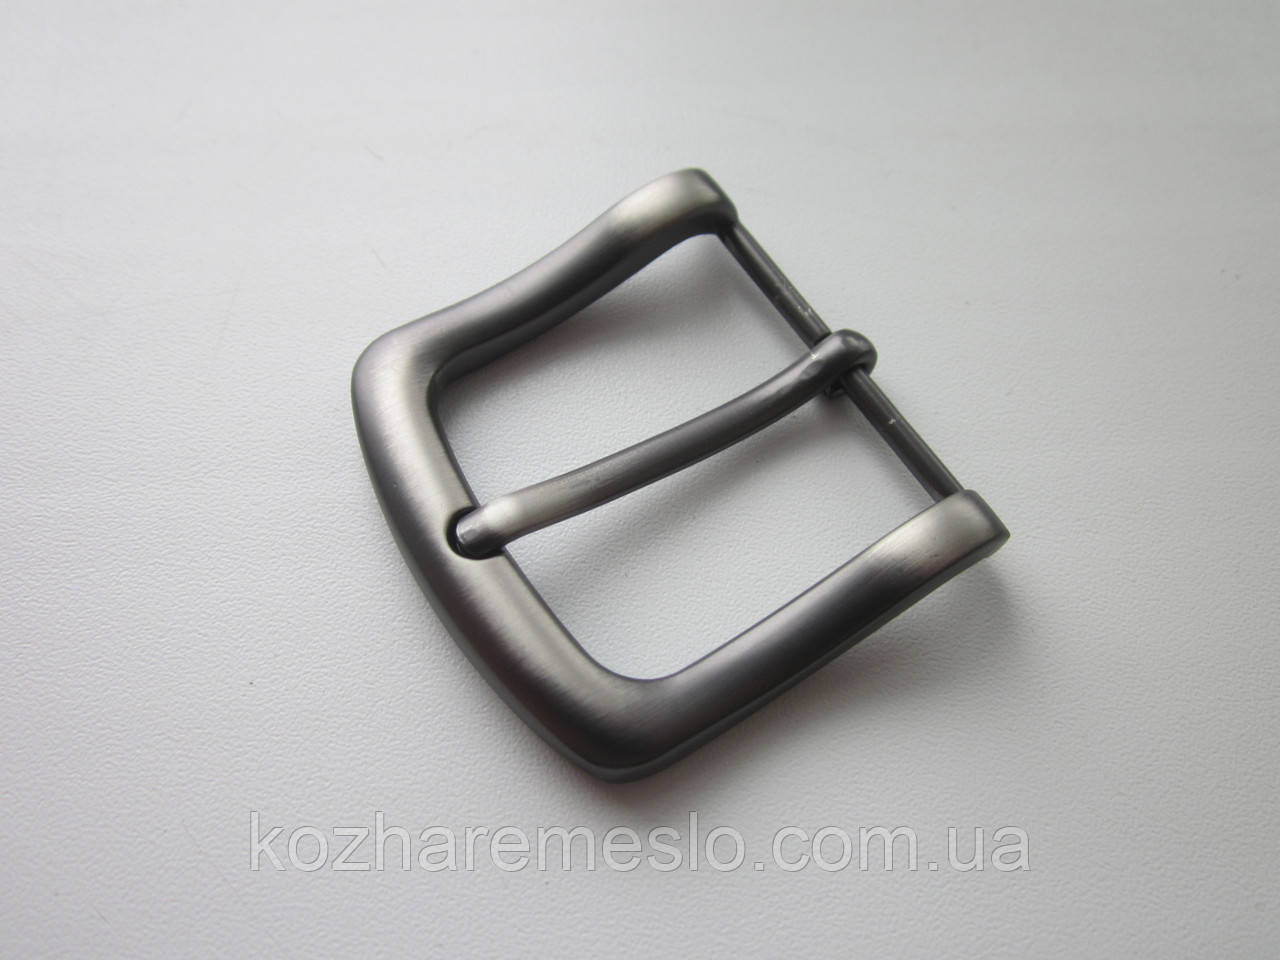 Пряжка 40 мм титан